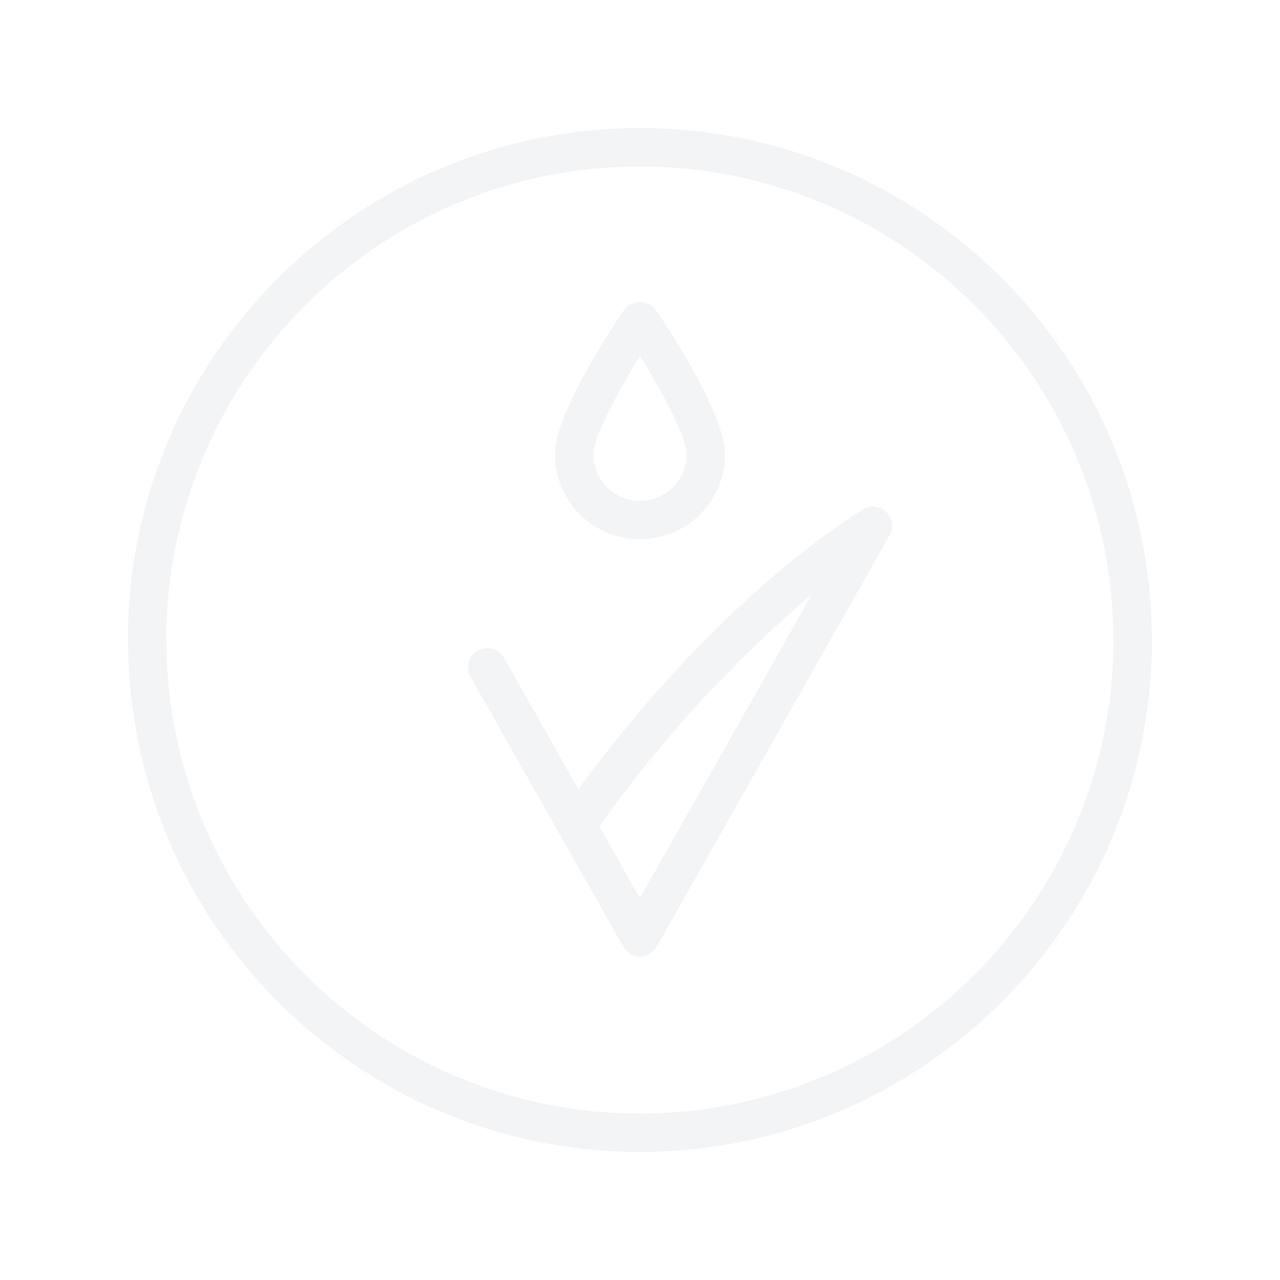 ORGANIC SHOP Grapefruit & Lime Shower Gel 280ml